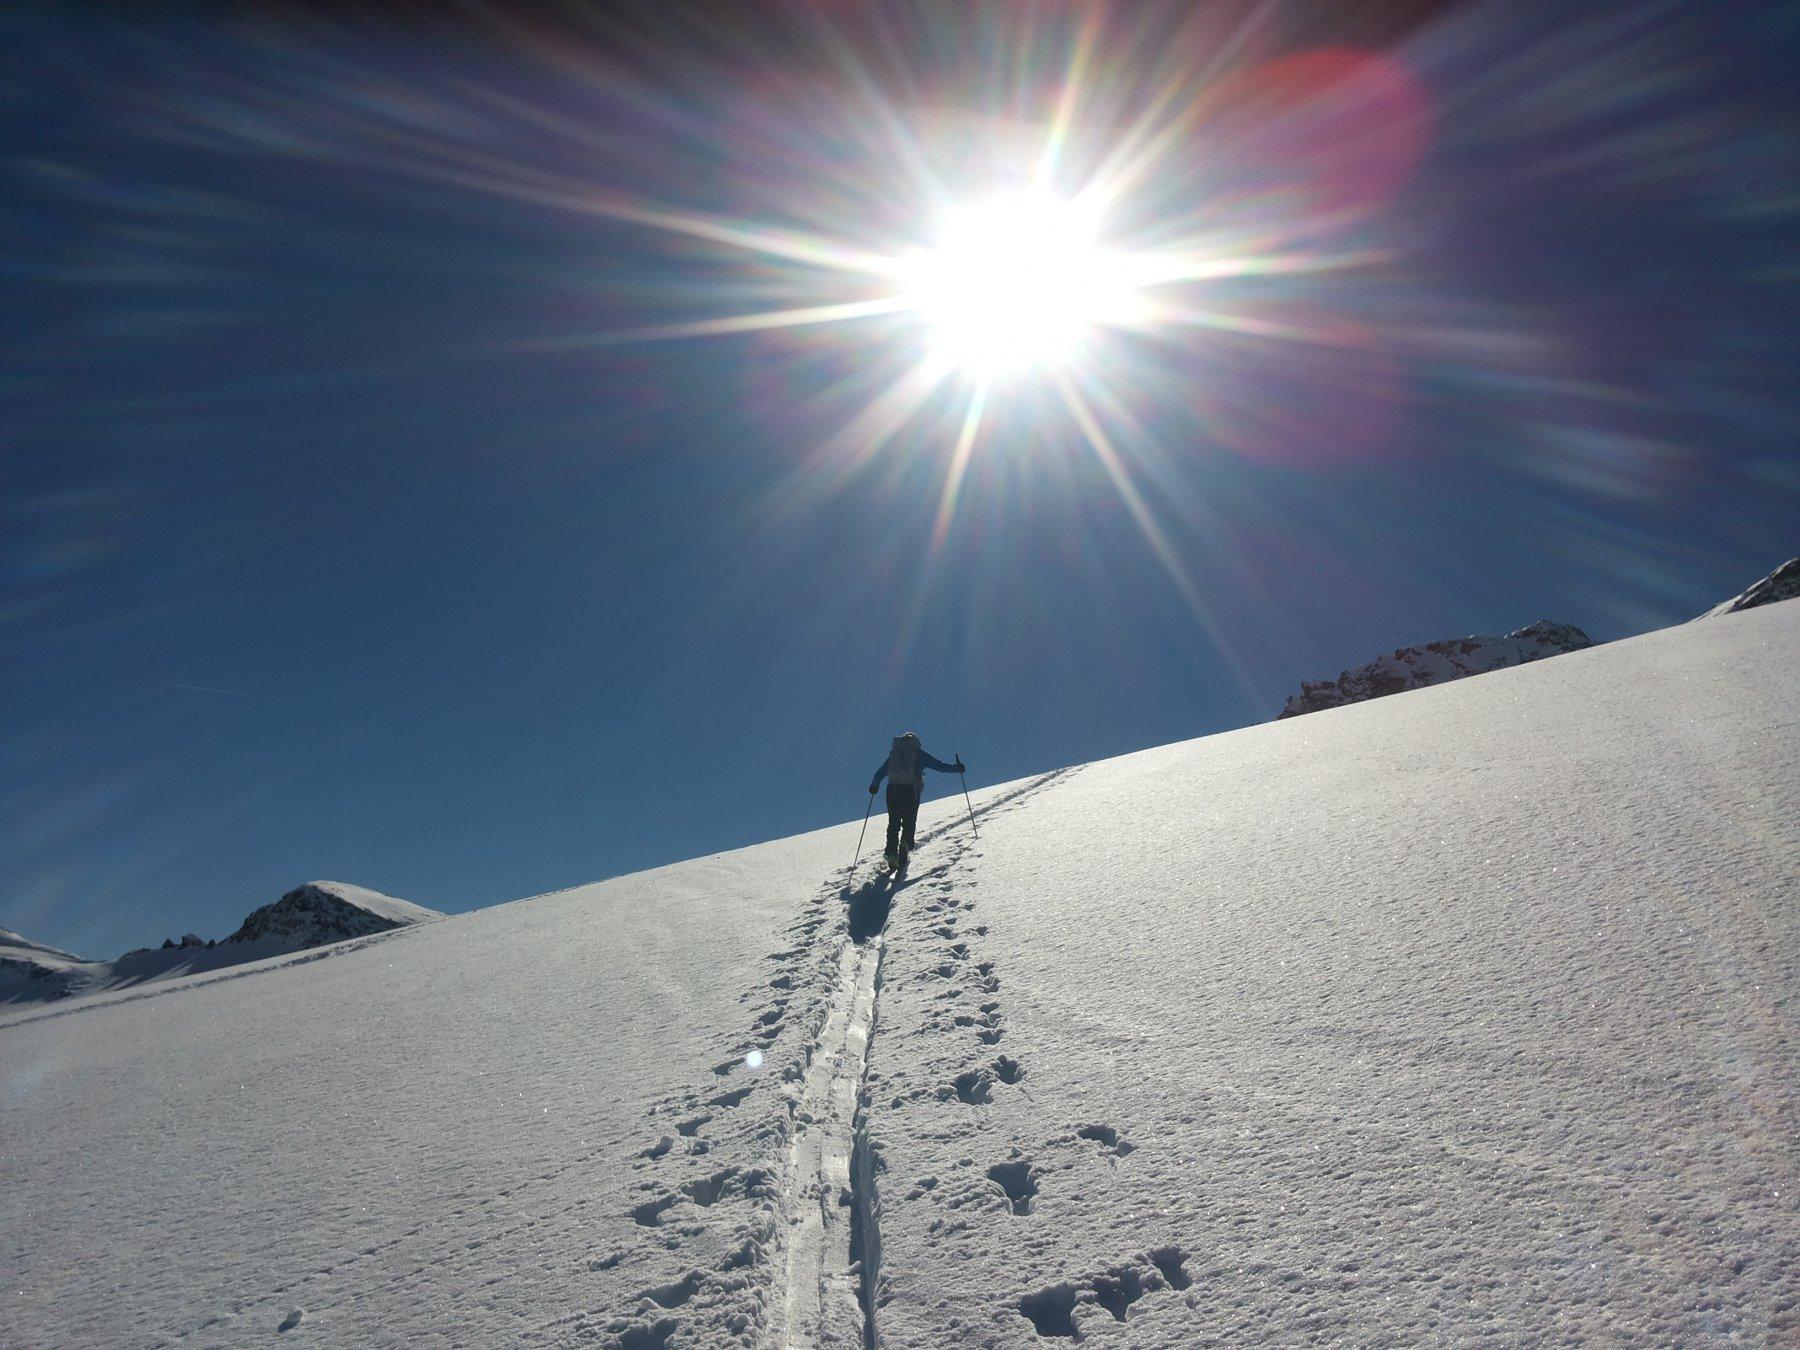 Salita sil ghiacciaio dello Scalino...oggi spazi x tutti